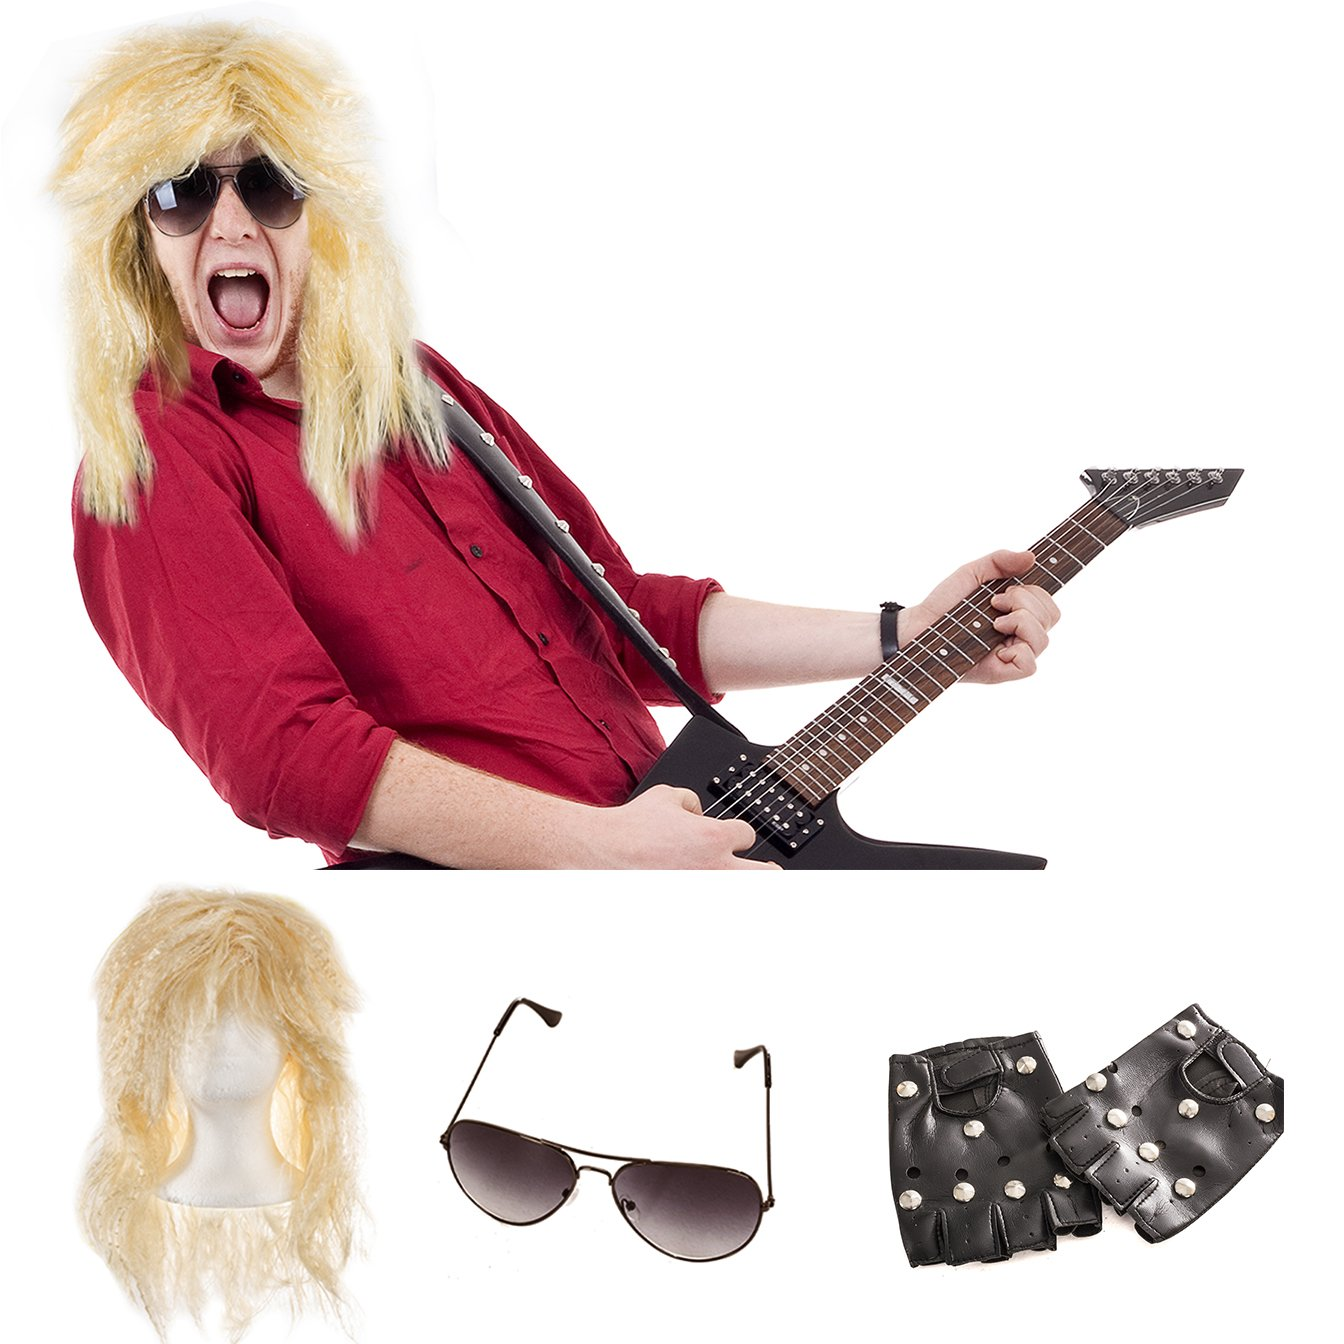 Tigerdoe Rockstar Costume - 80s Costumes - Heavy Metal Wig - Rocker Accessories Top Hat Aviators)